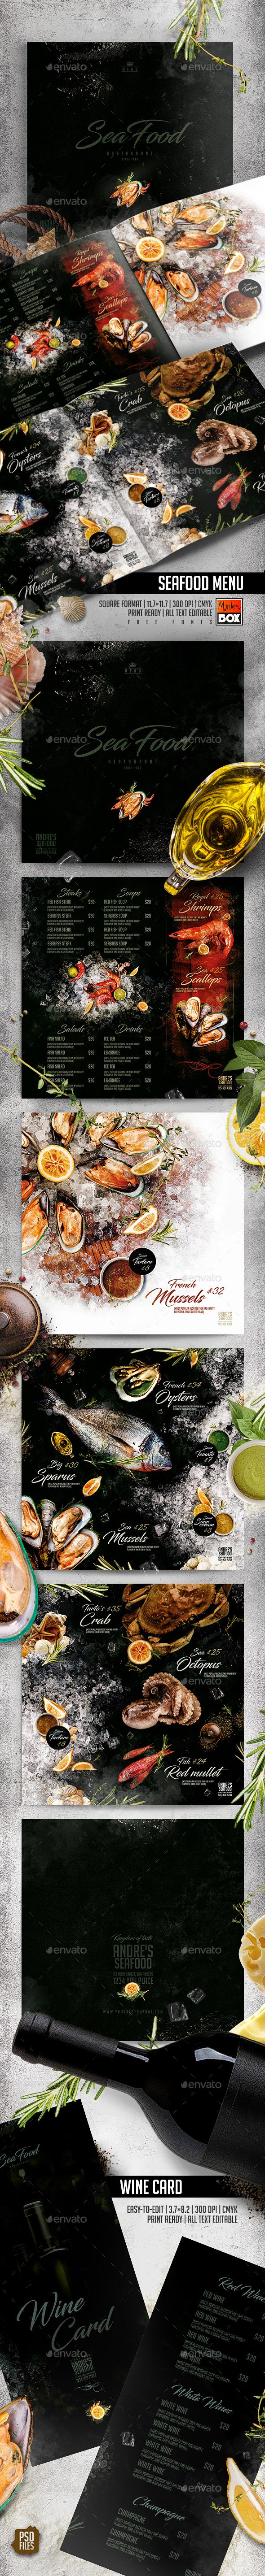 Seafood Menu - Food Menus Print Templates